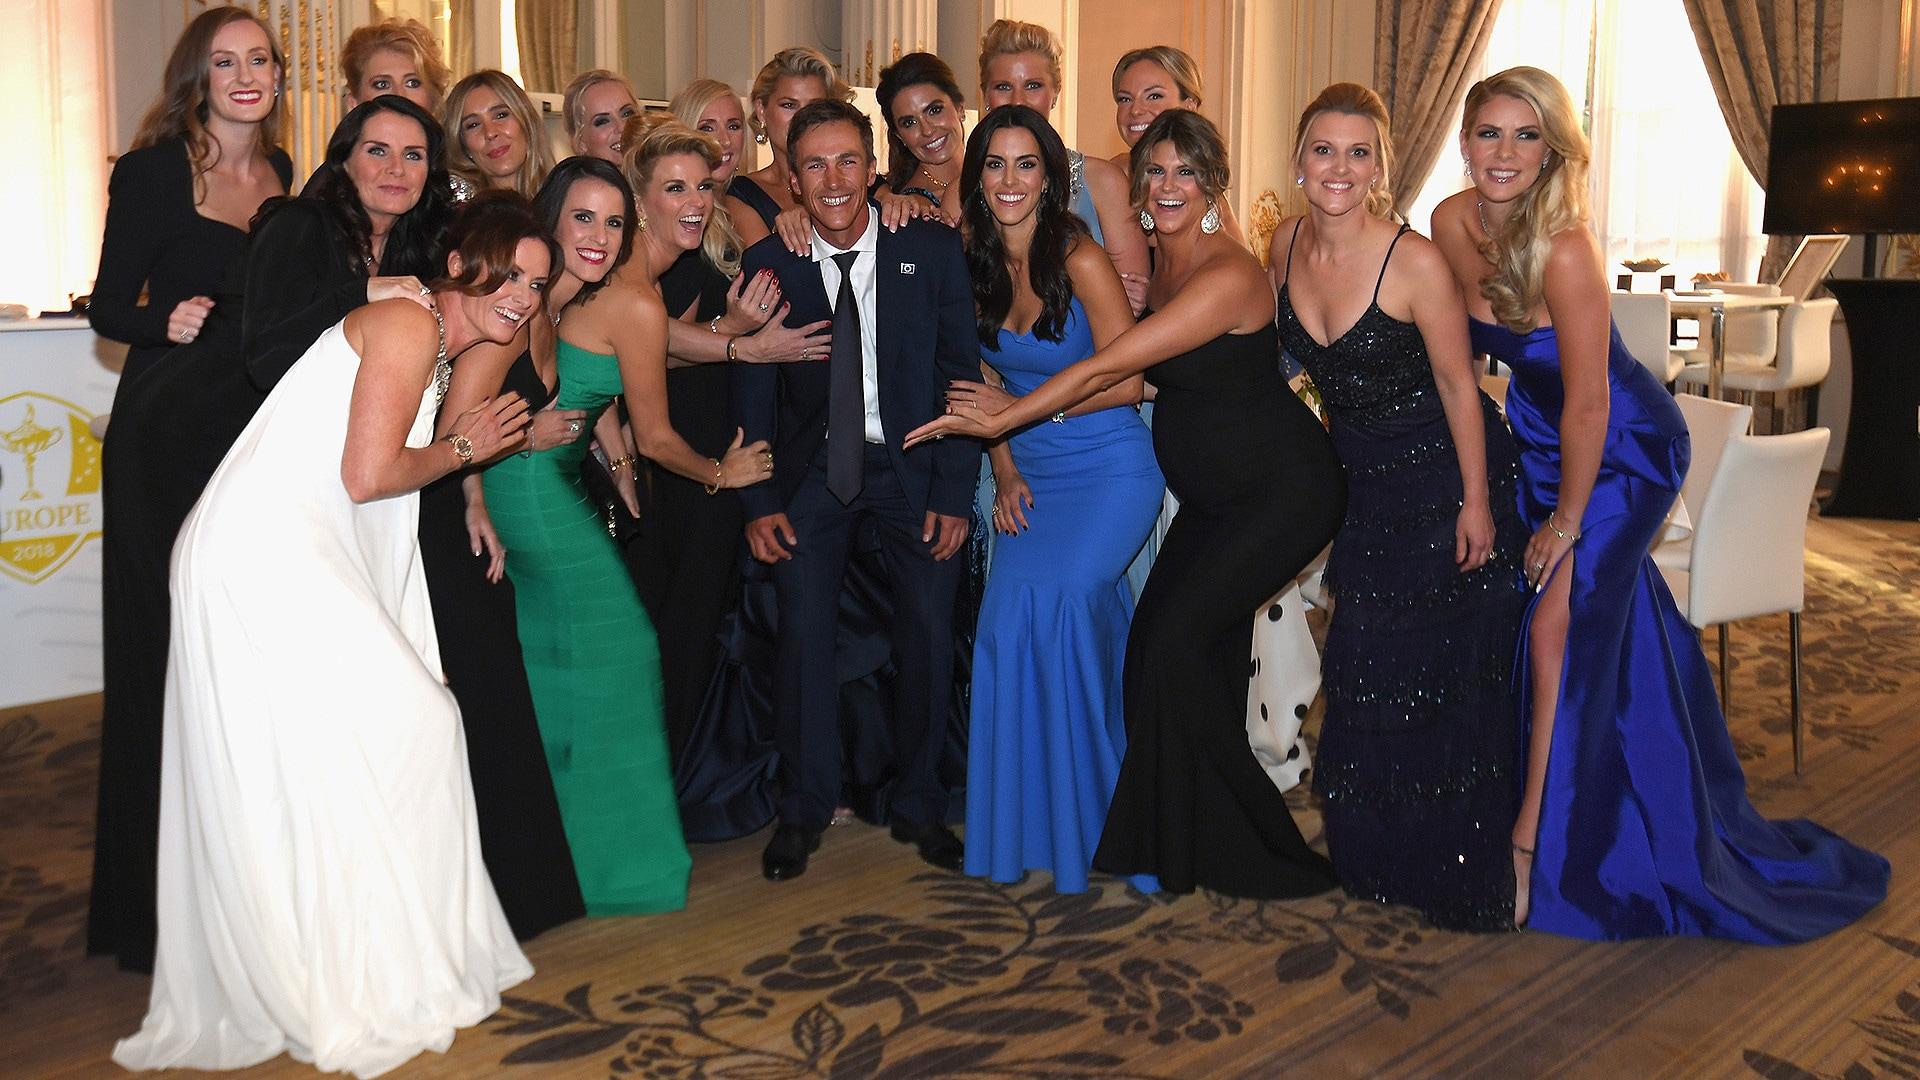 Rookie Thorbjorn Olesen a 'Pretty Happy Man' in Gala Photo ...